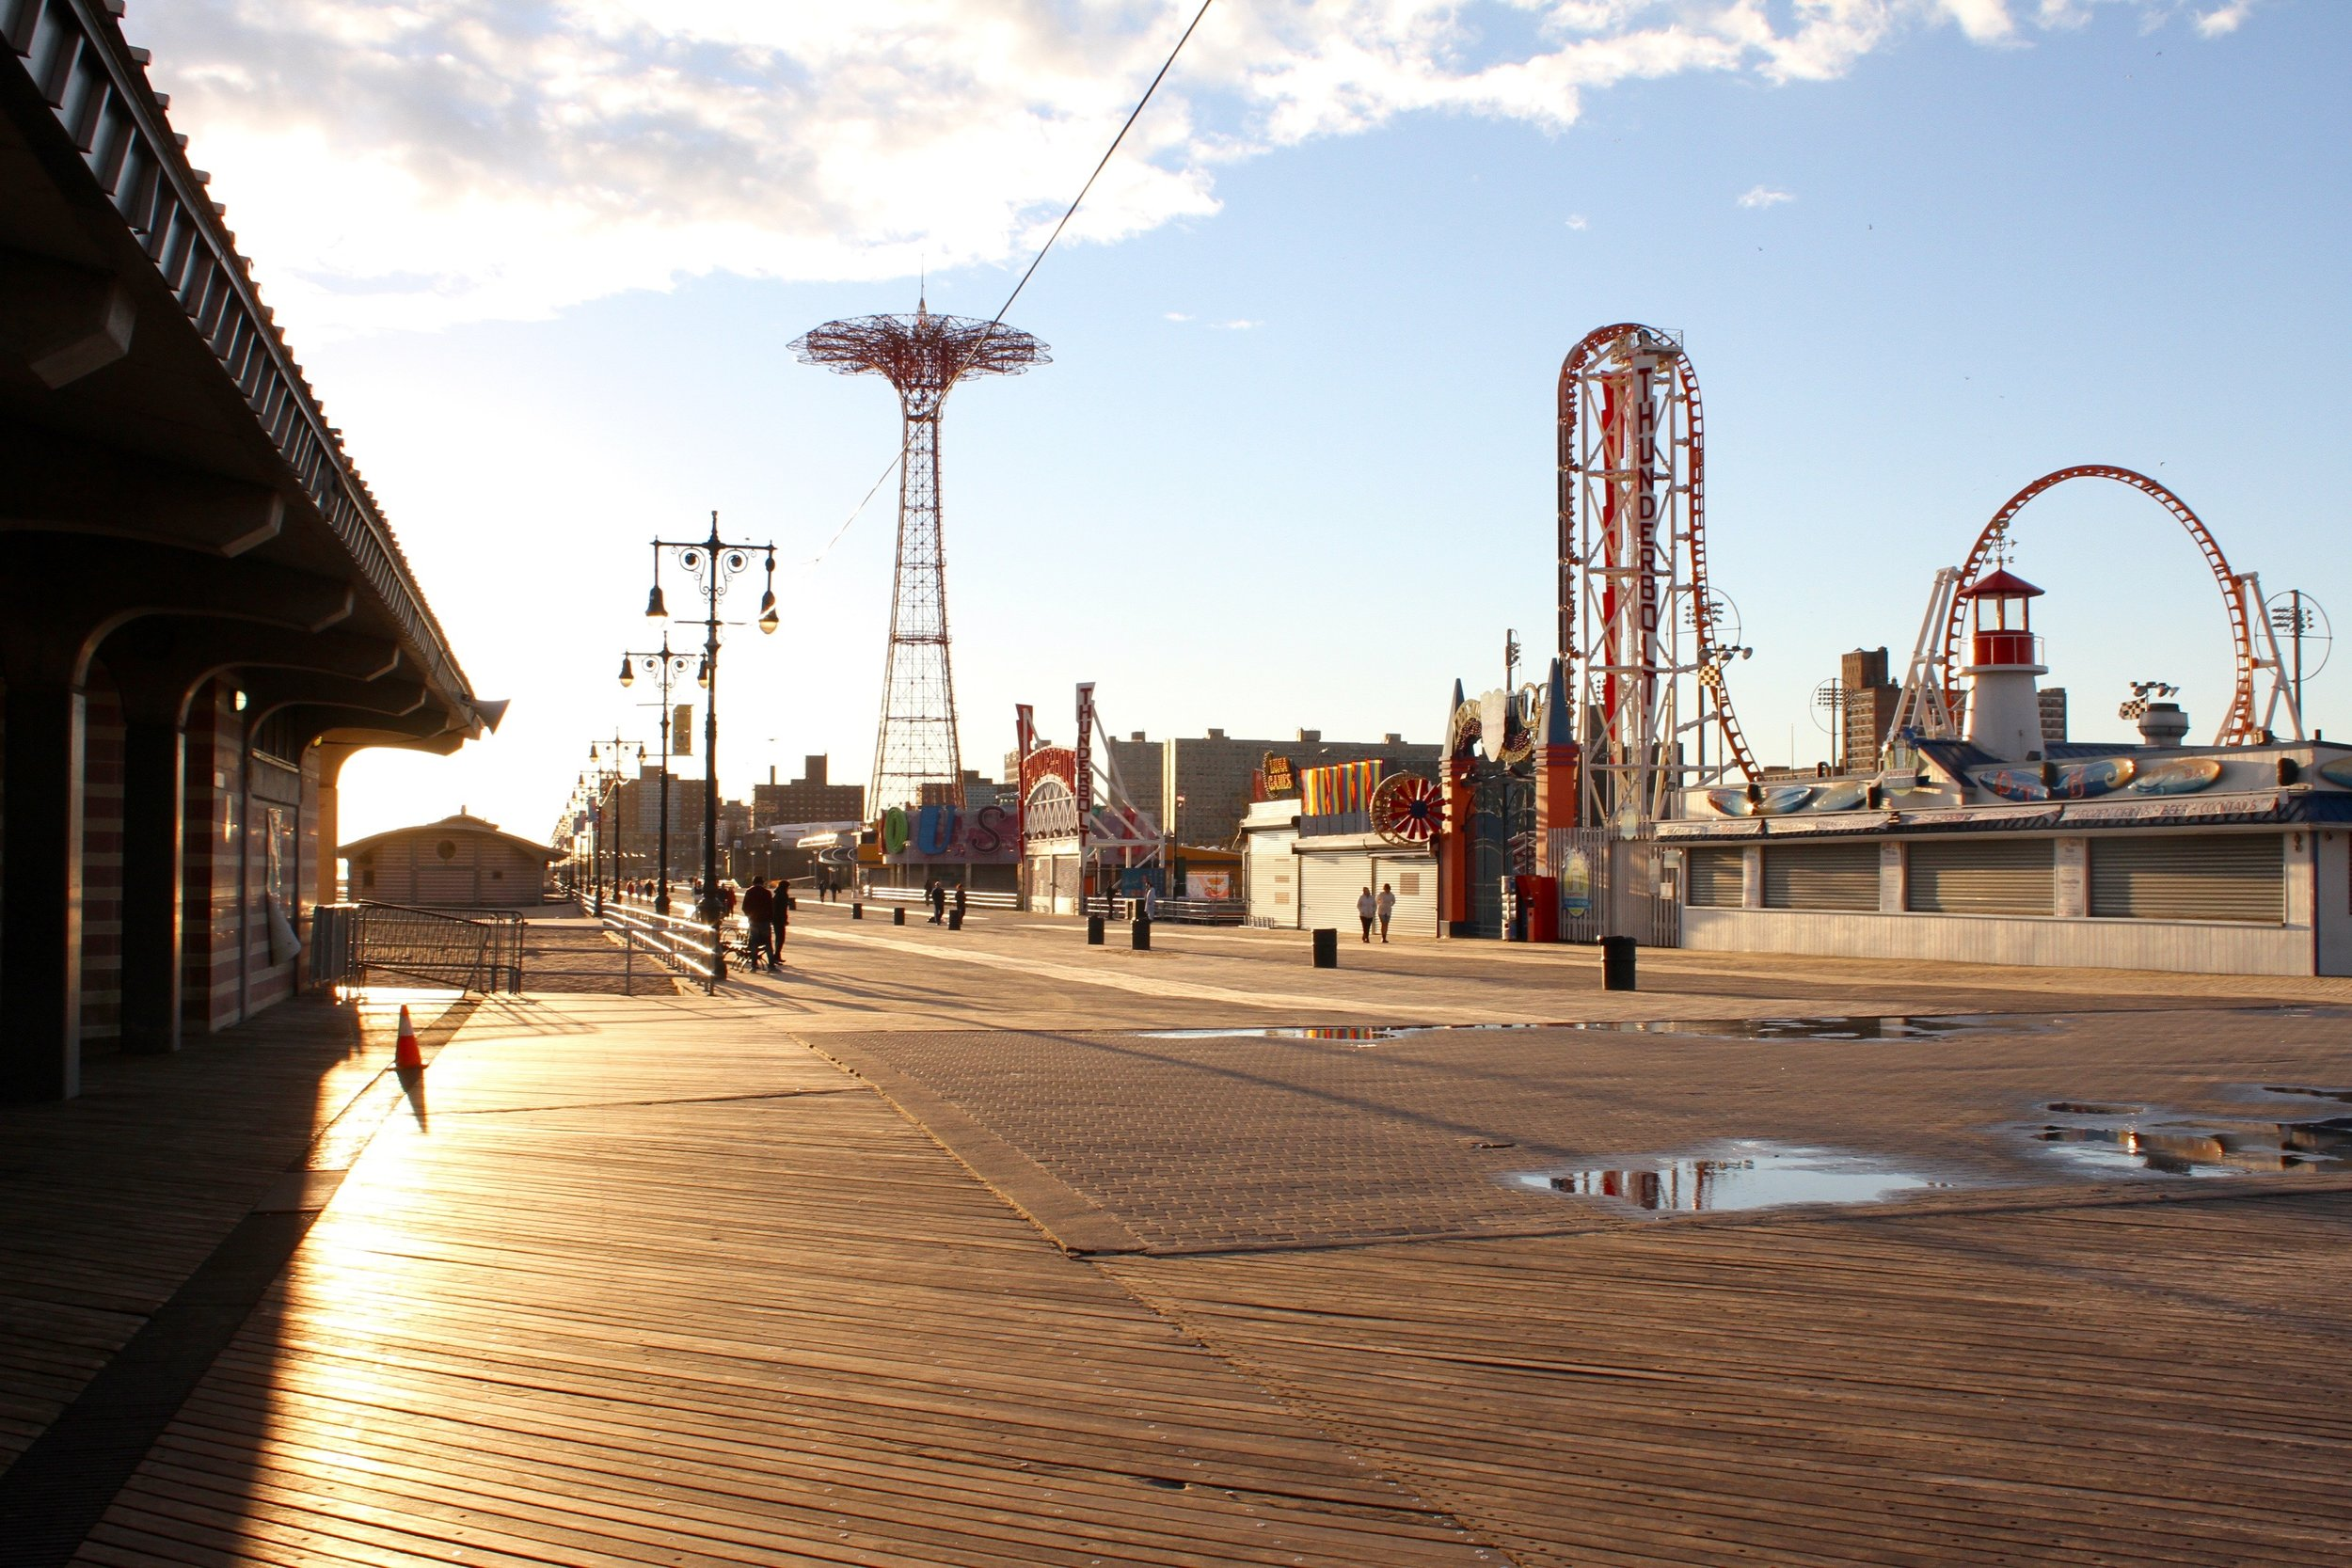 The Boardwalk - Coney Island